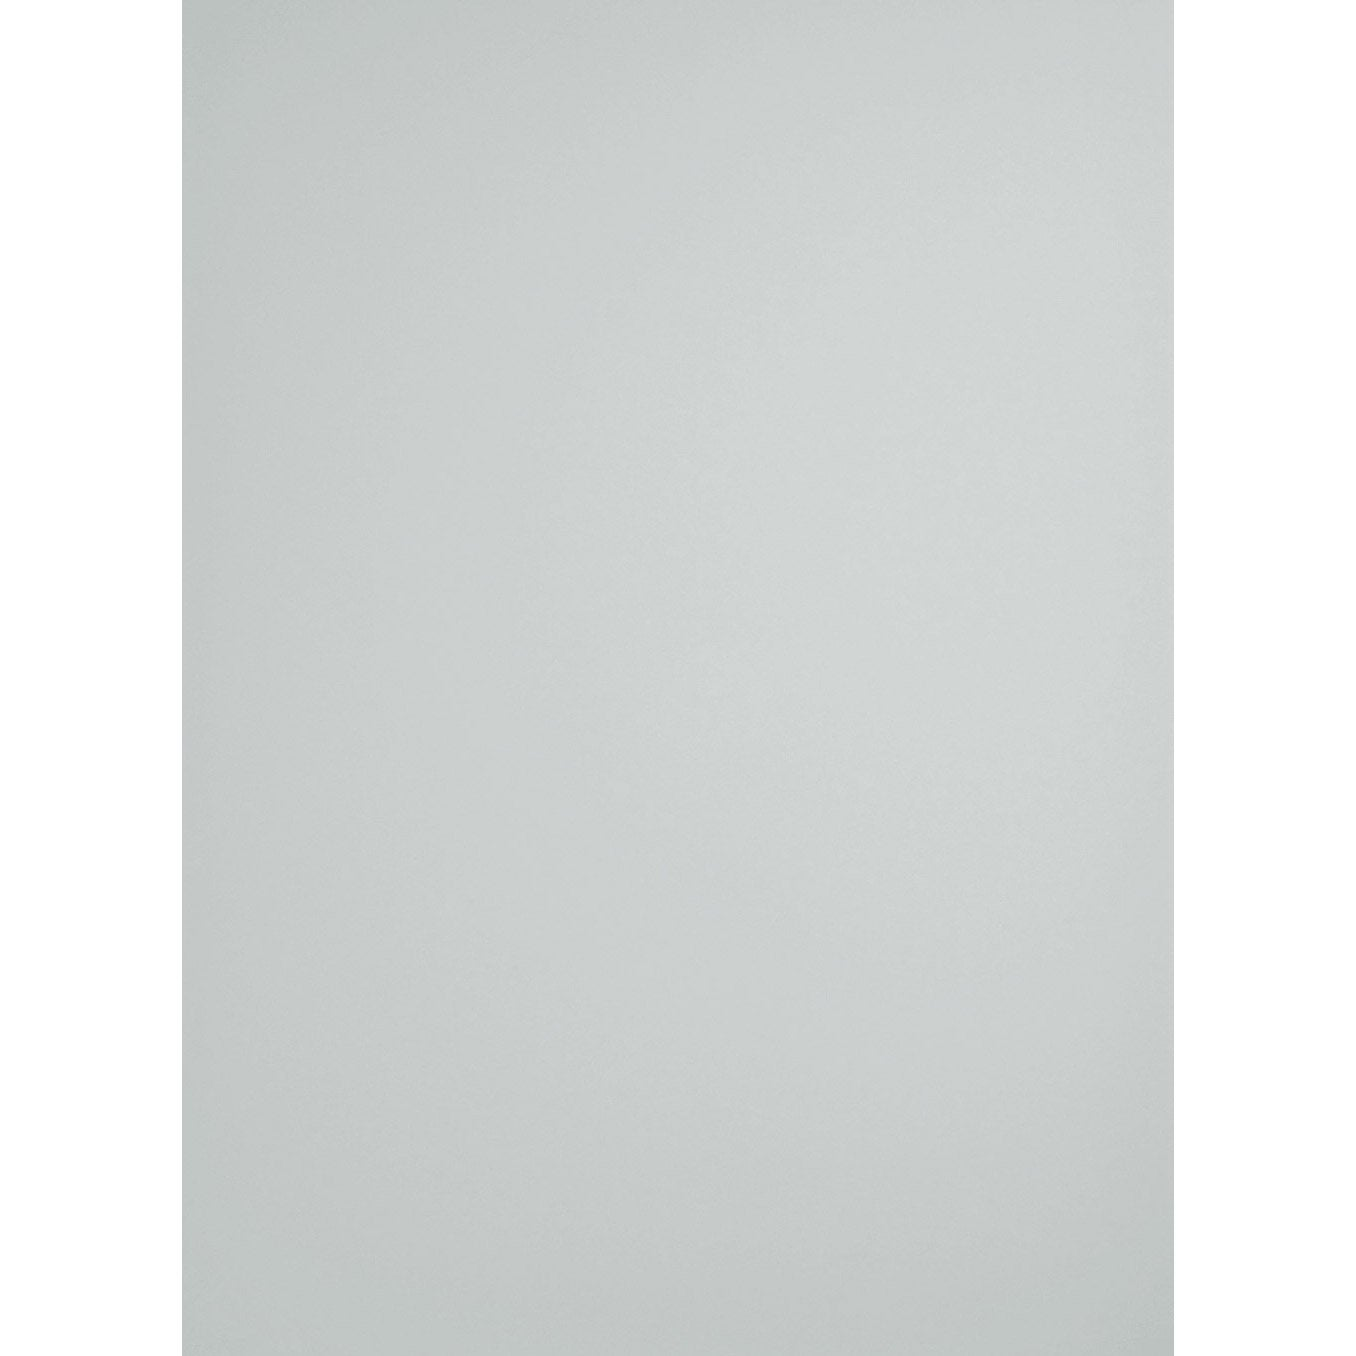 Verre clair blanc laiteux x cm 4 mm leroy merlin - Leroy merlin plateau verre ...